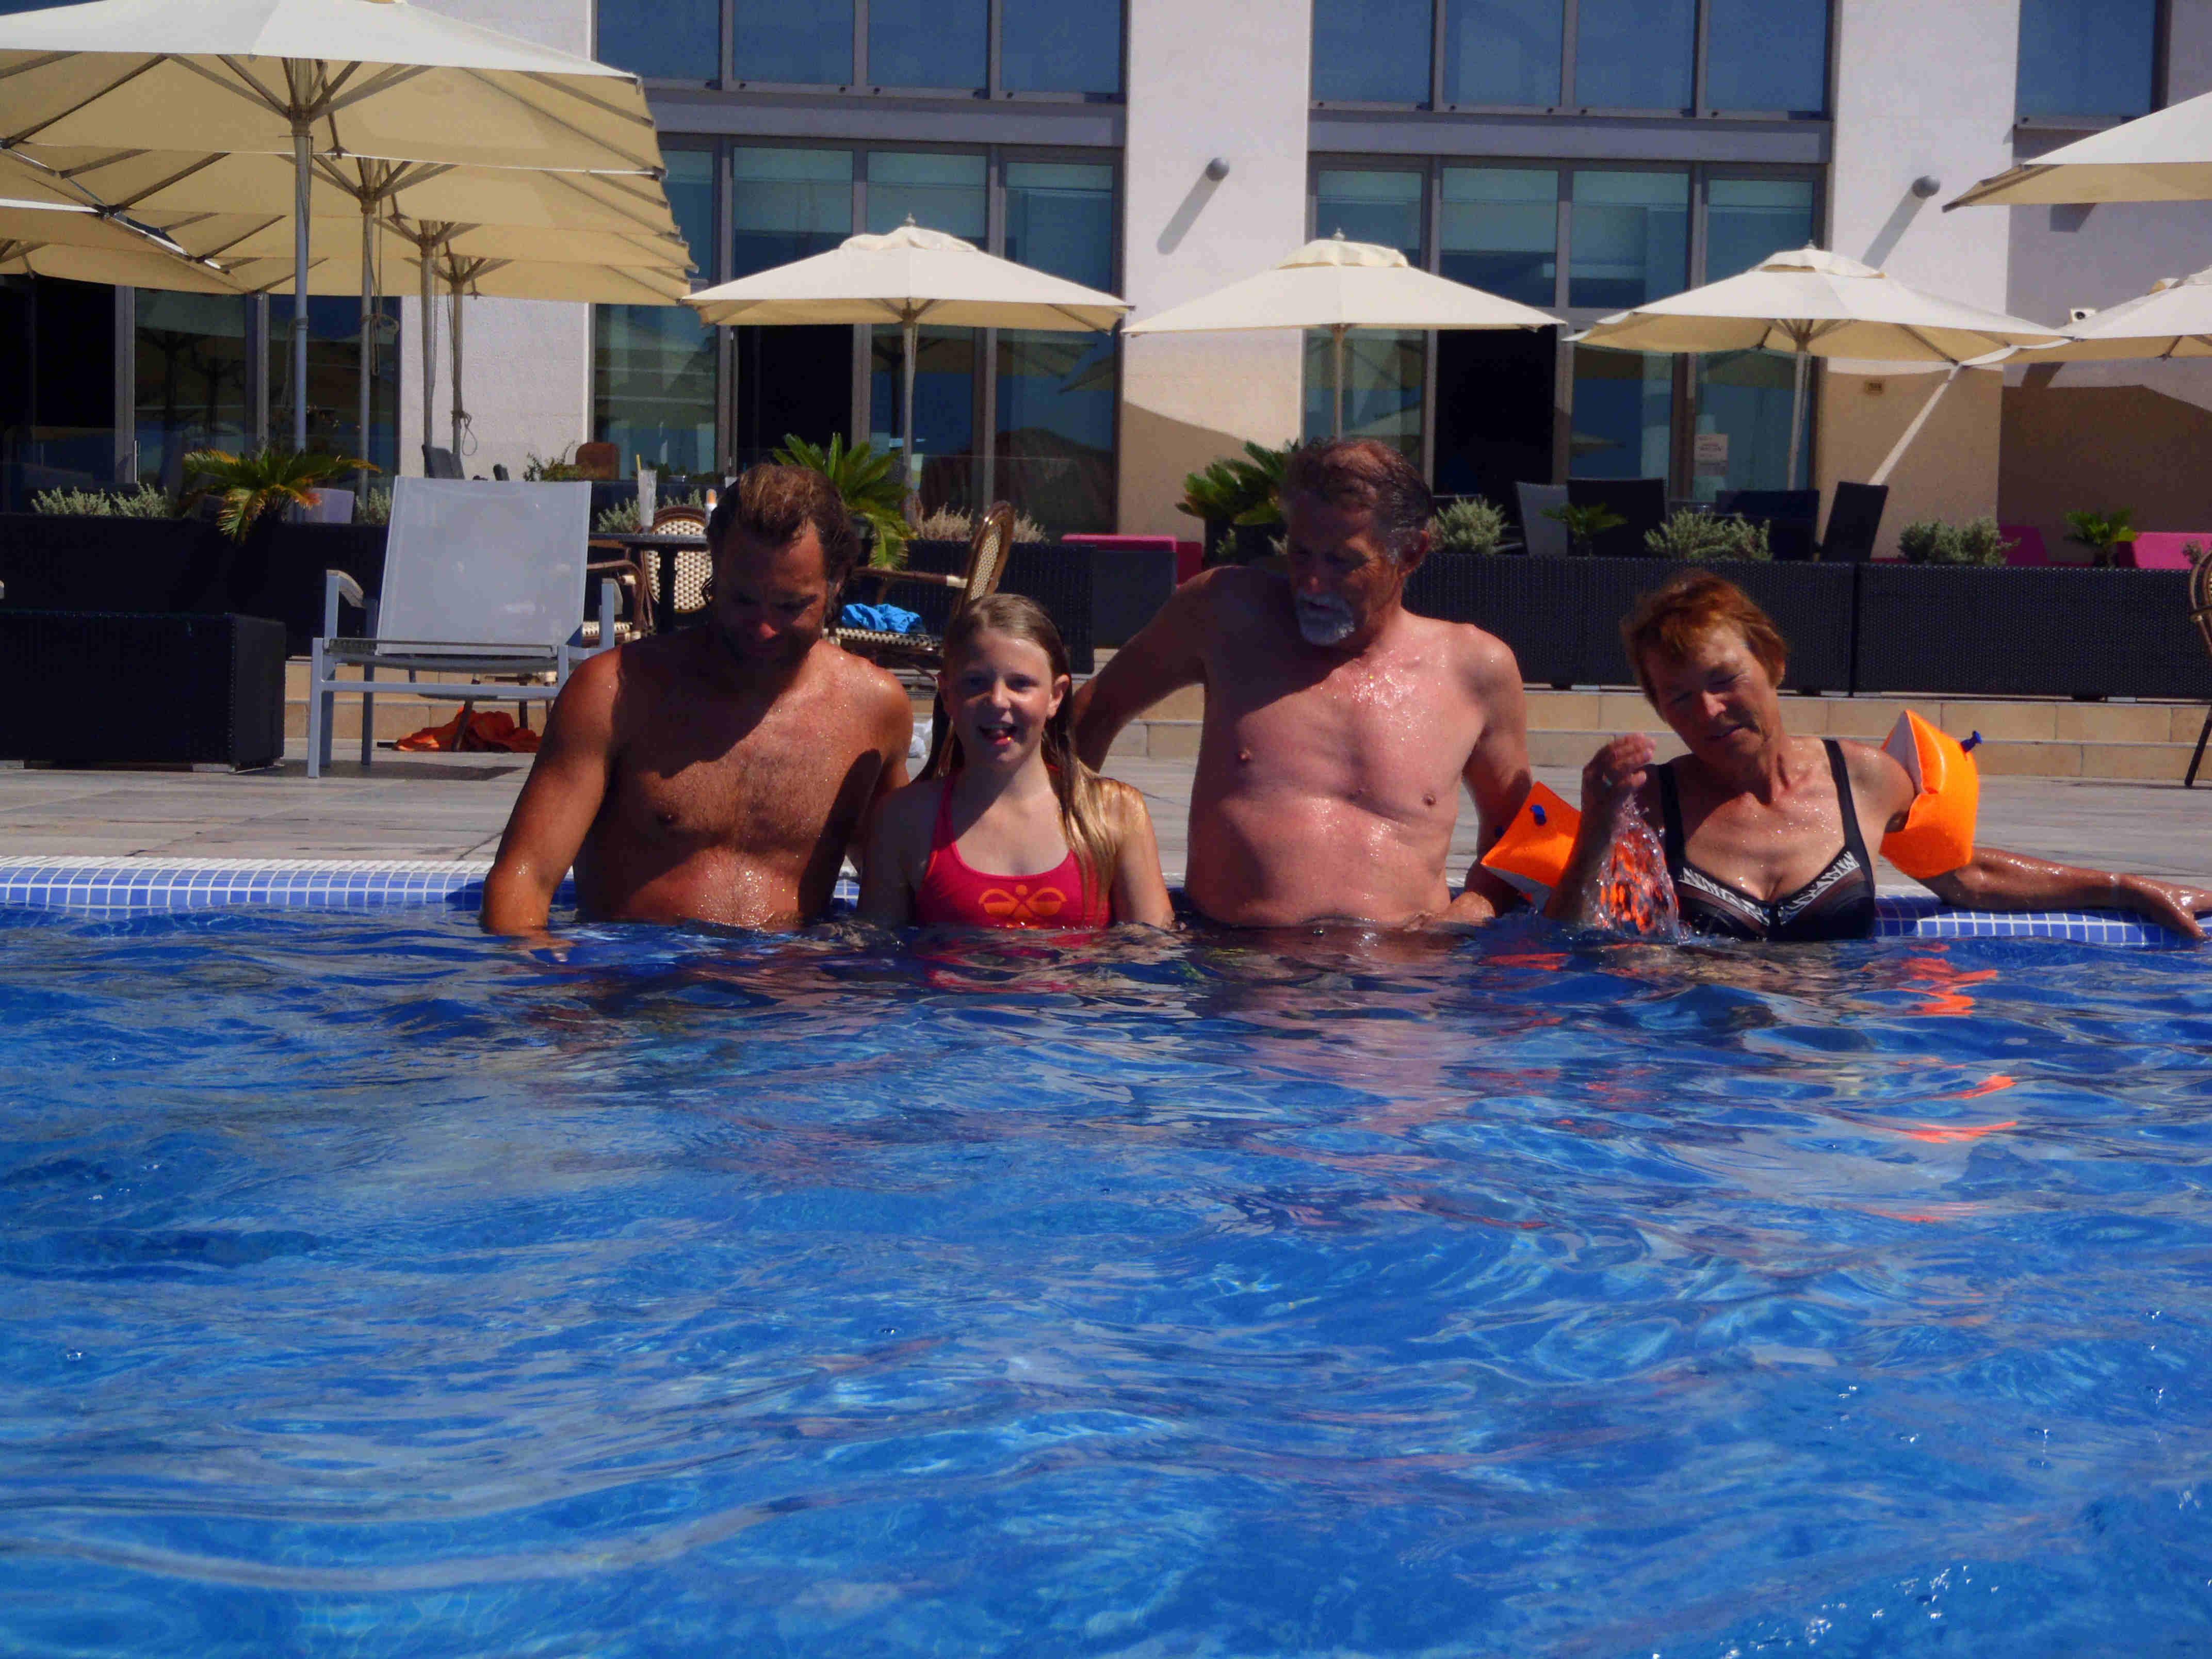 Familien_Mørk_Rasmussen_i_poolen.jpg